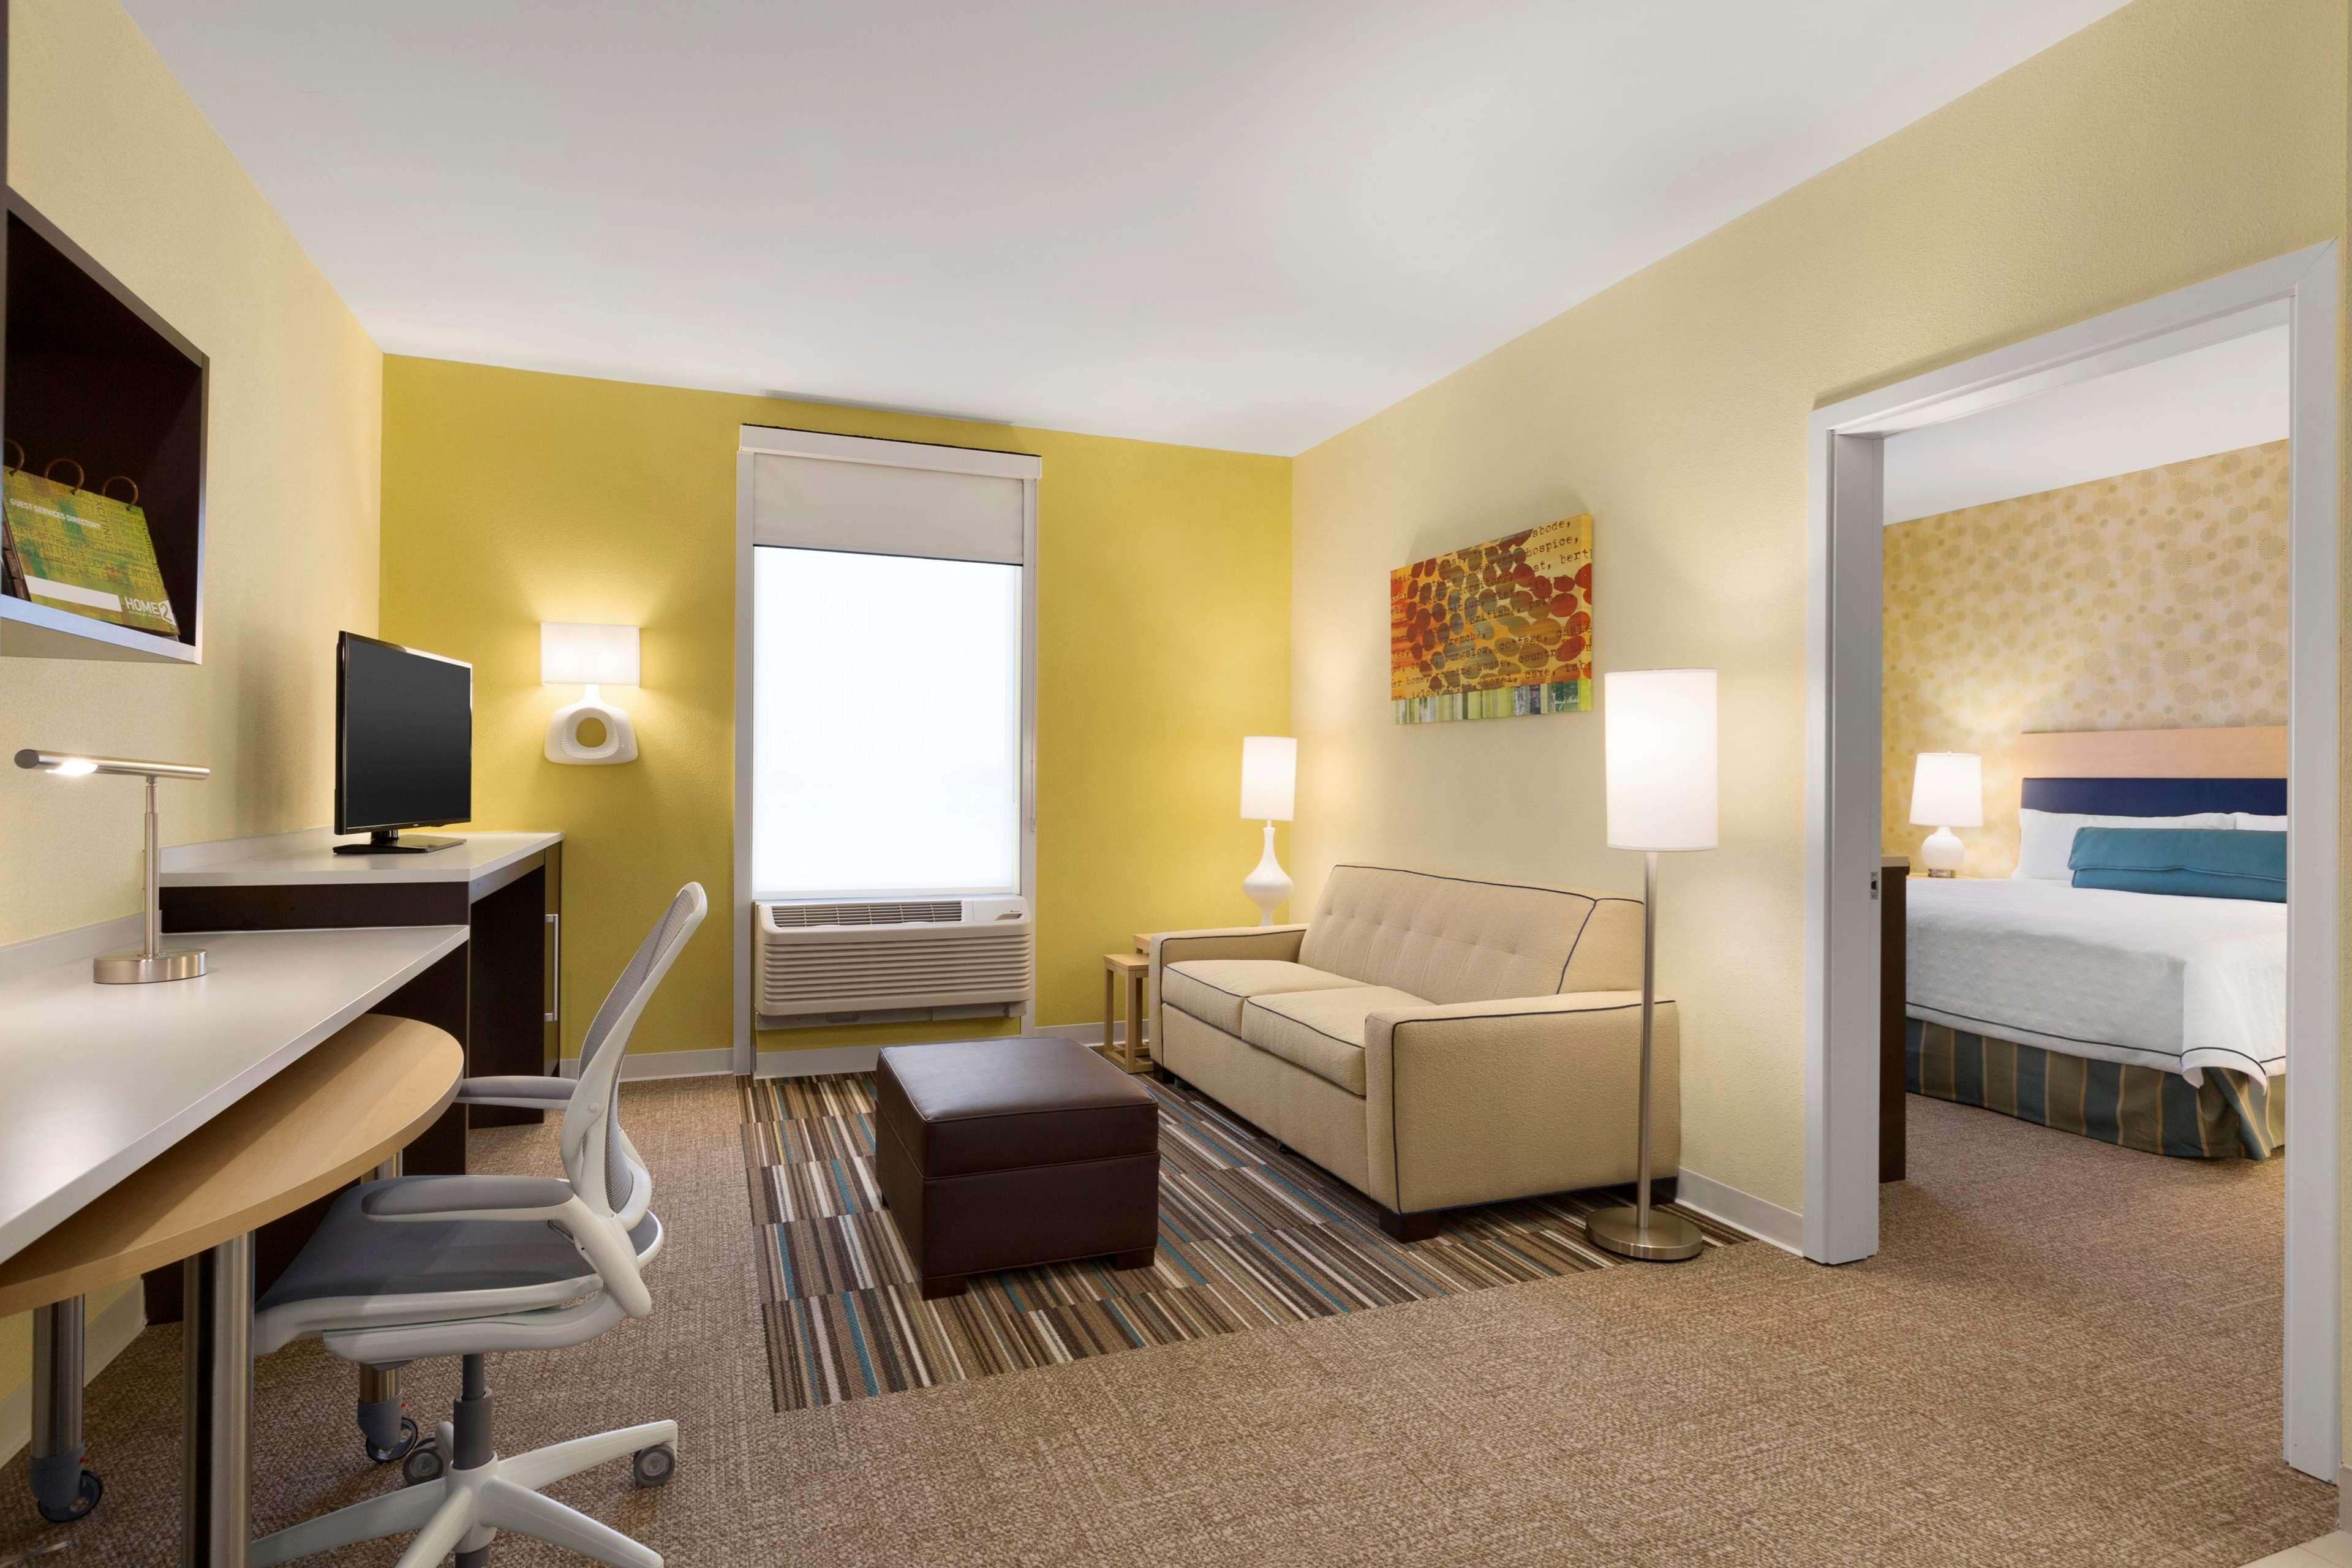 Home2 Suites by Hilton Houston Pasadena image 7